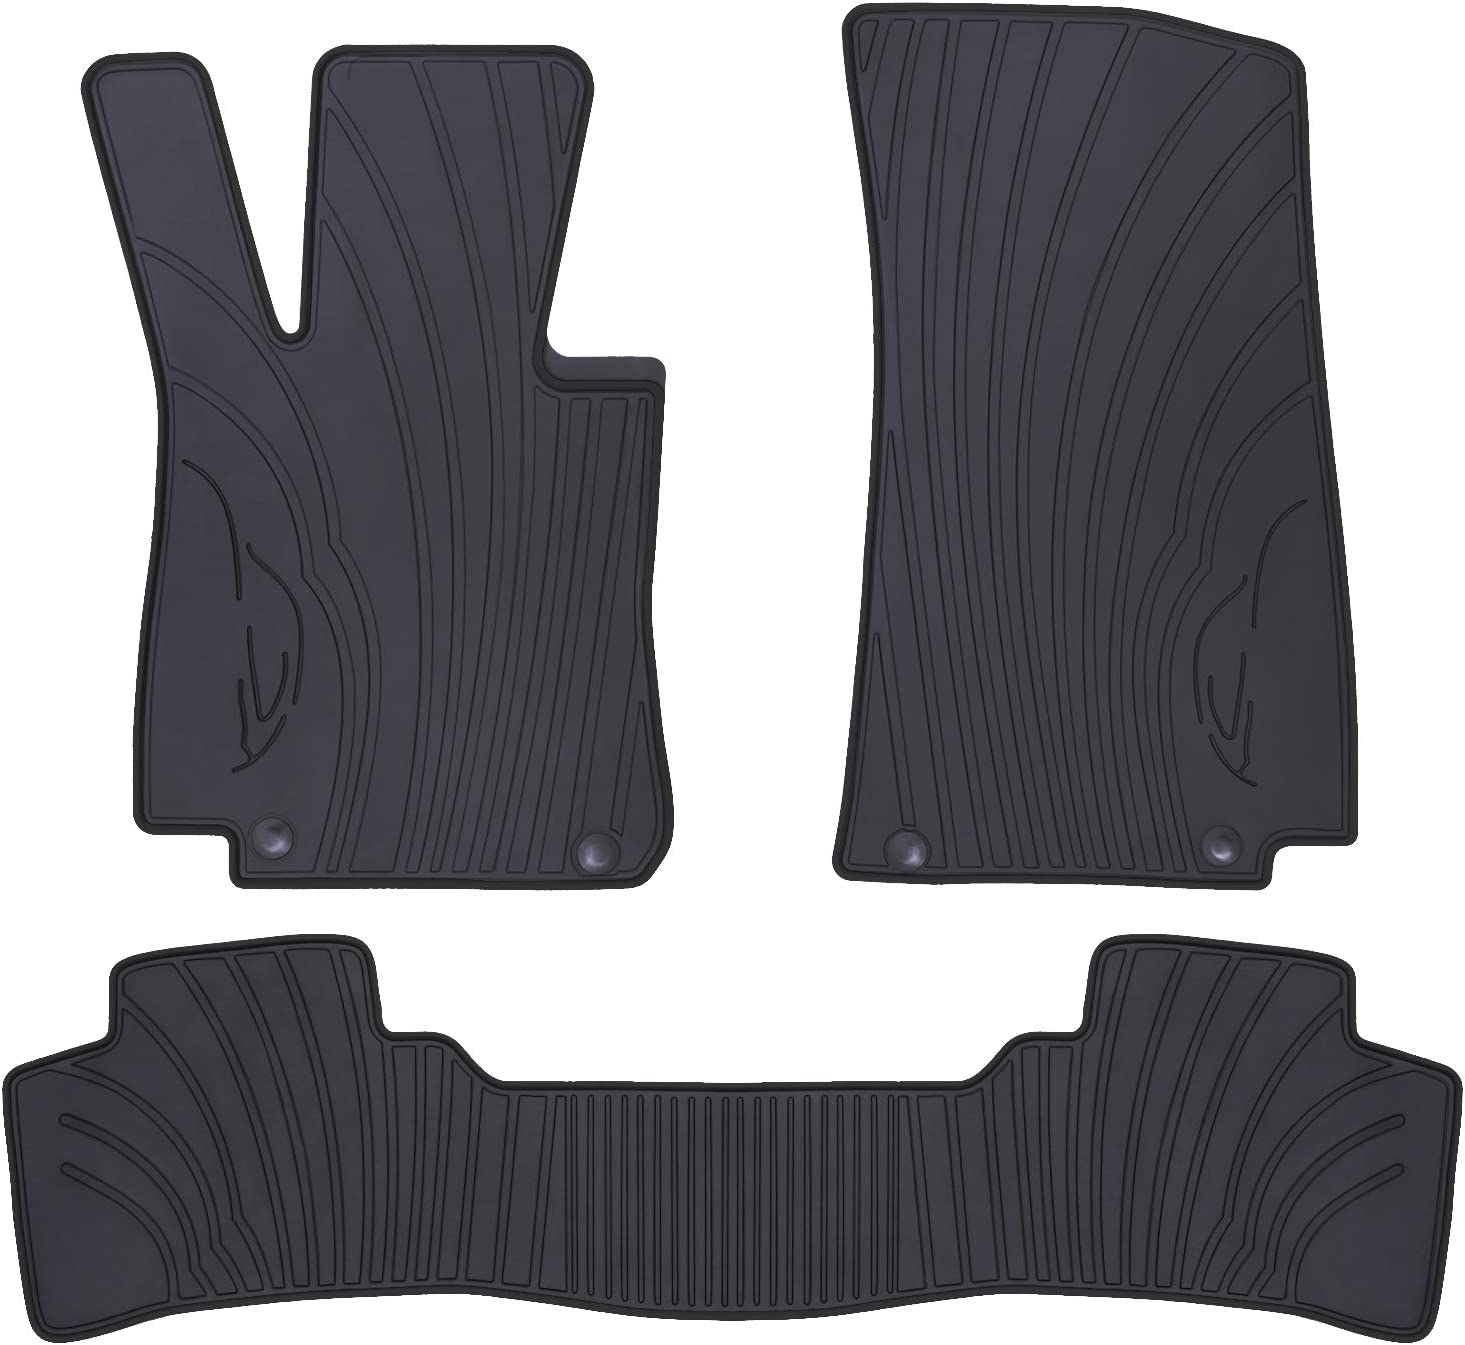 San Auto Car Floor Mat for Mercedes-Benz GLC 2016 2017 2018 2019 Custom Fit Full Black Auto Floor Liners All Weather Heavy Duty Odorless